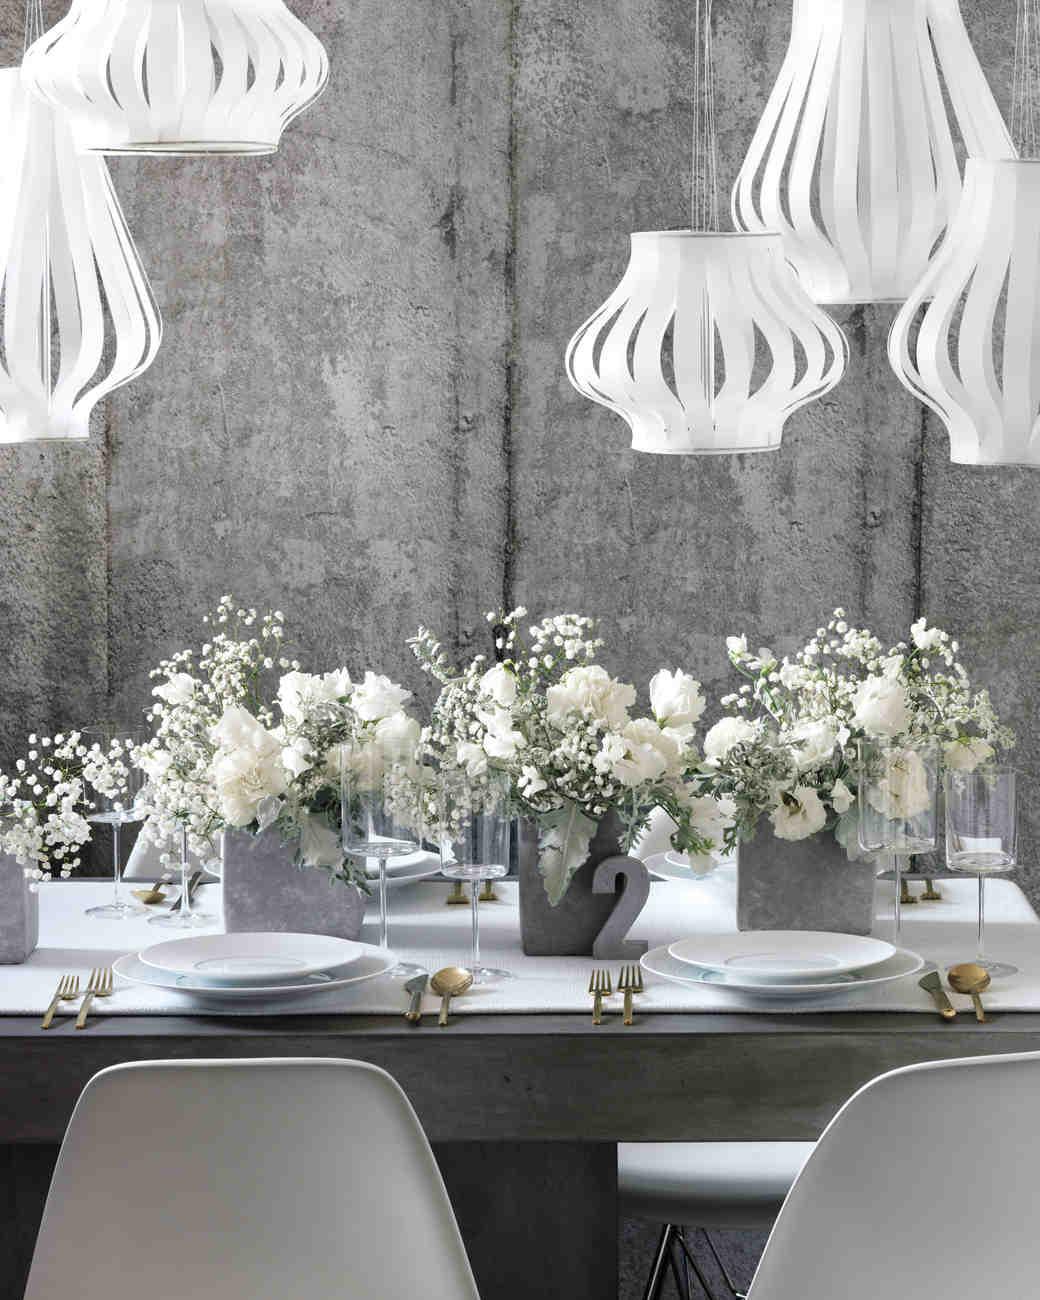 Modern Wedding Decoration Ideas: 17 Overhead Wedding Decoration Ideas We Love